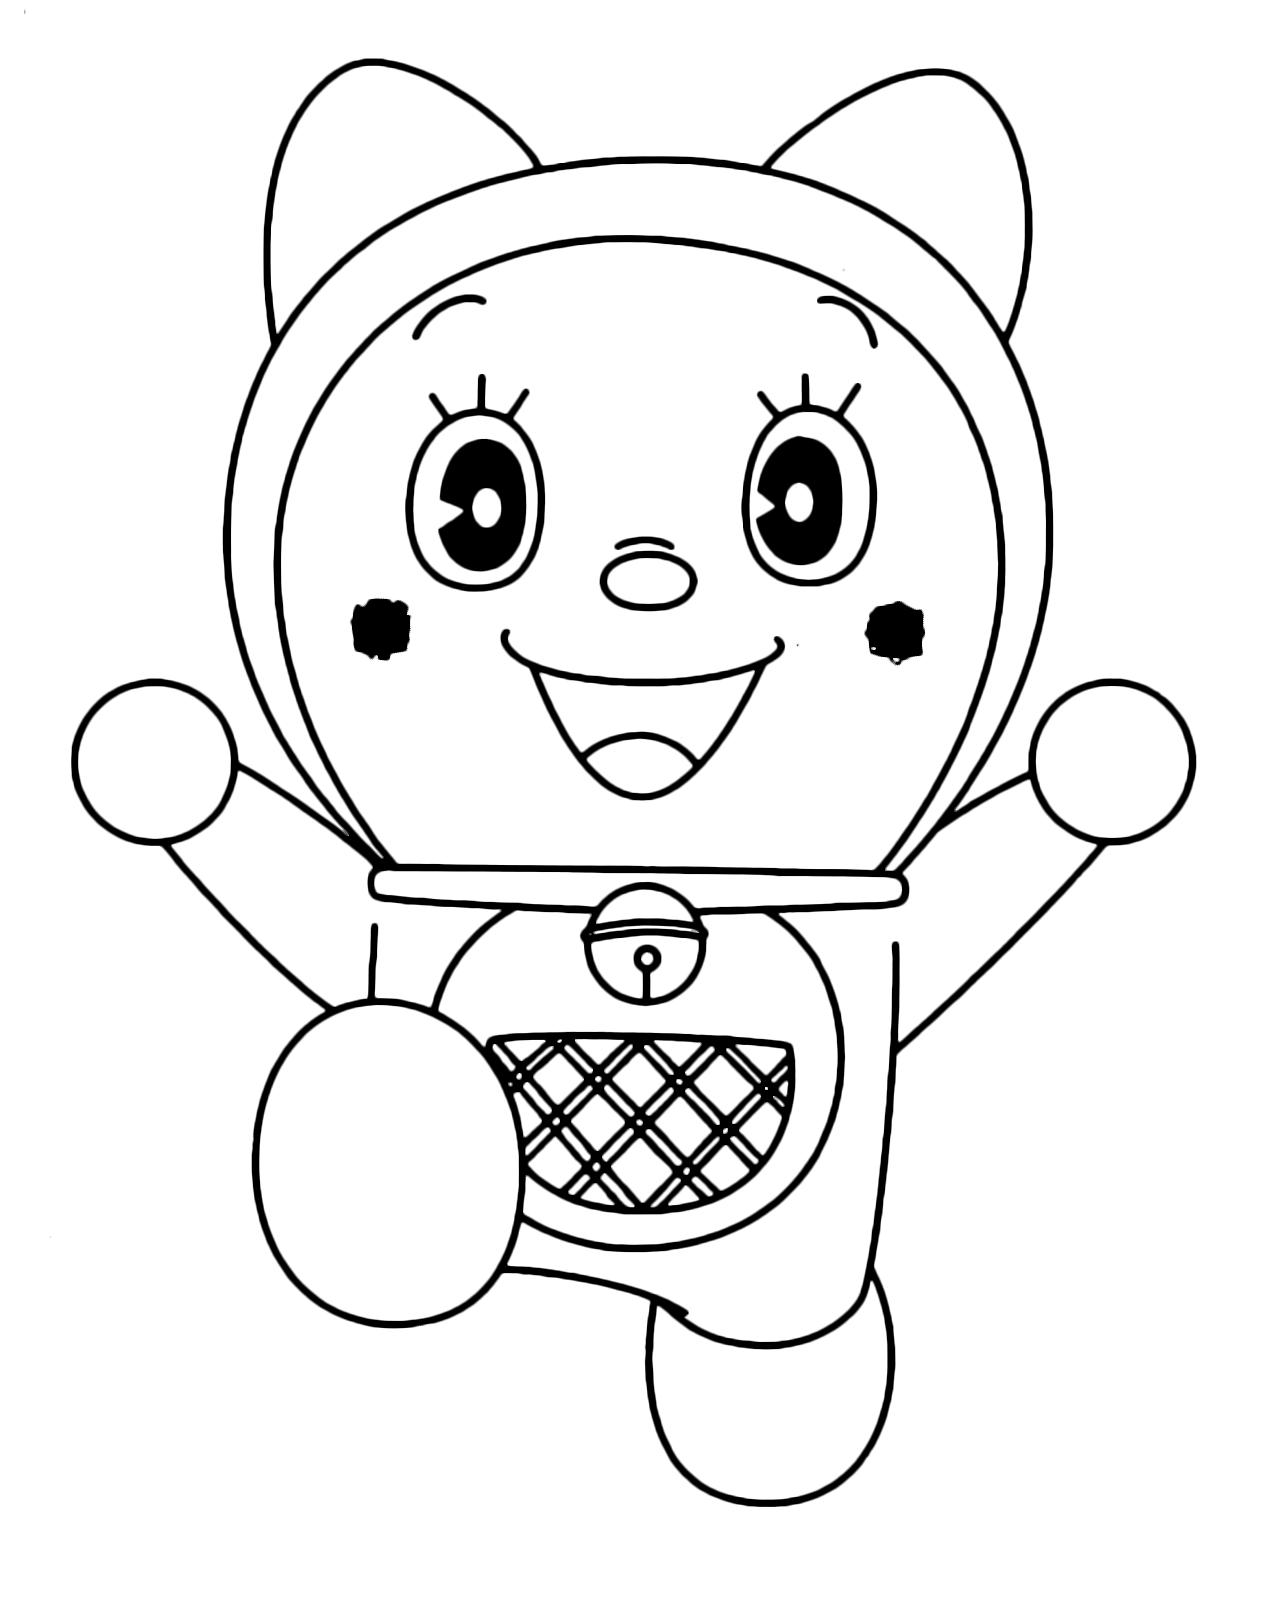 Here: Home Doraemon Say Hi to Doraemon Coloring Pages - DORAEMON